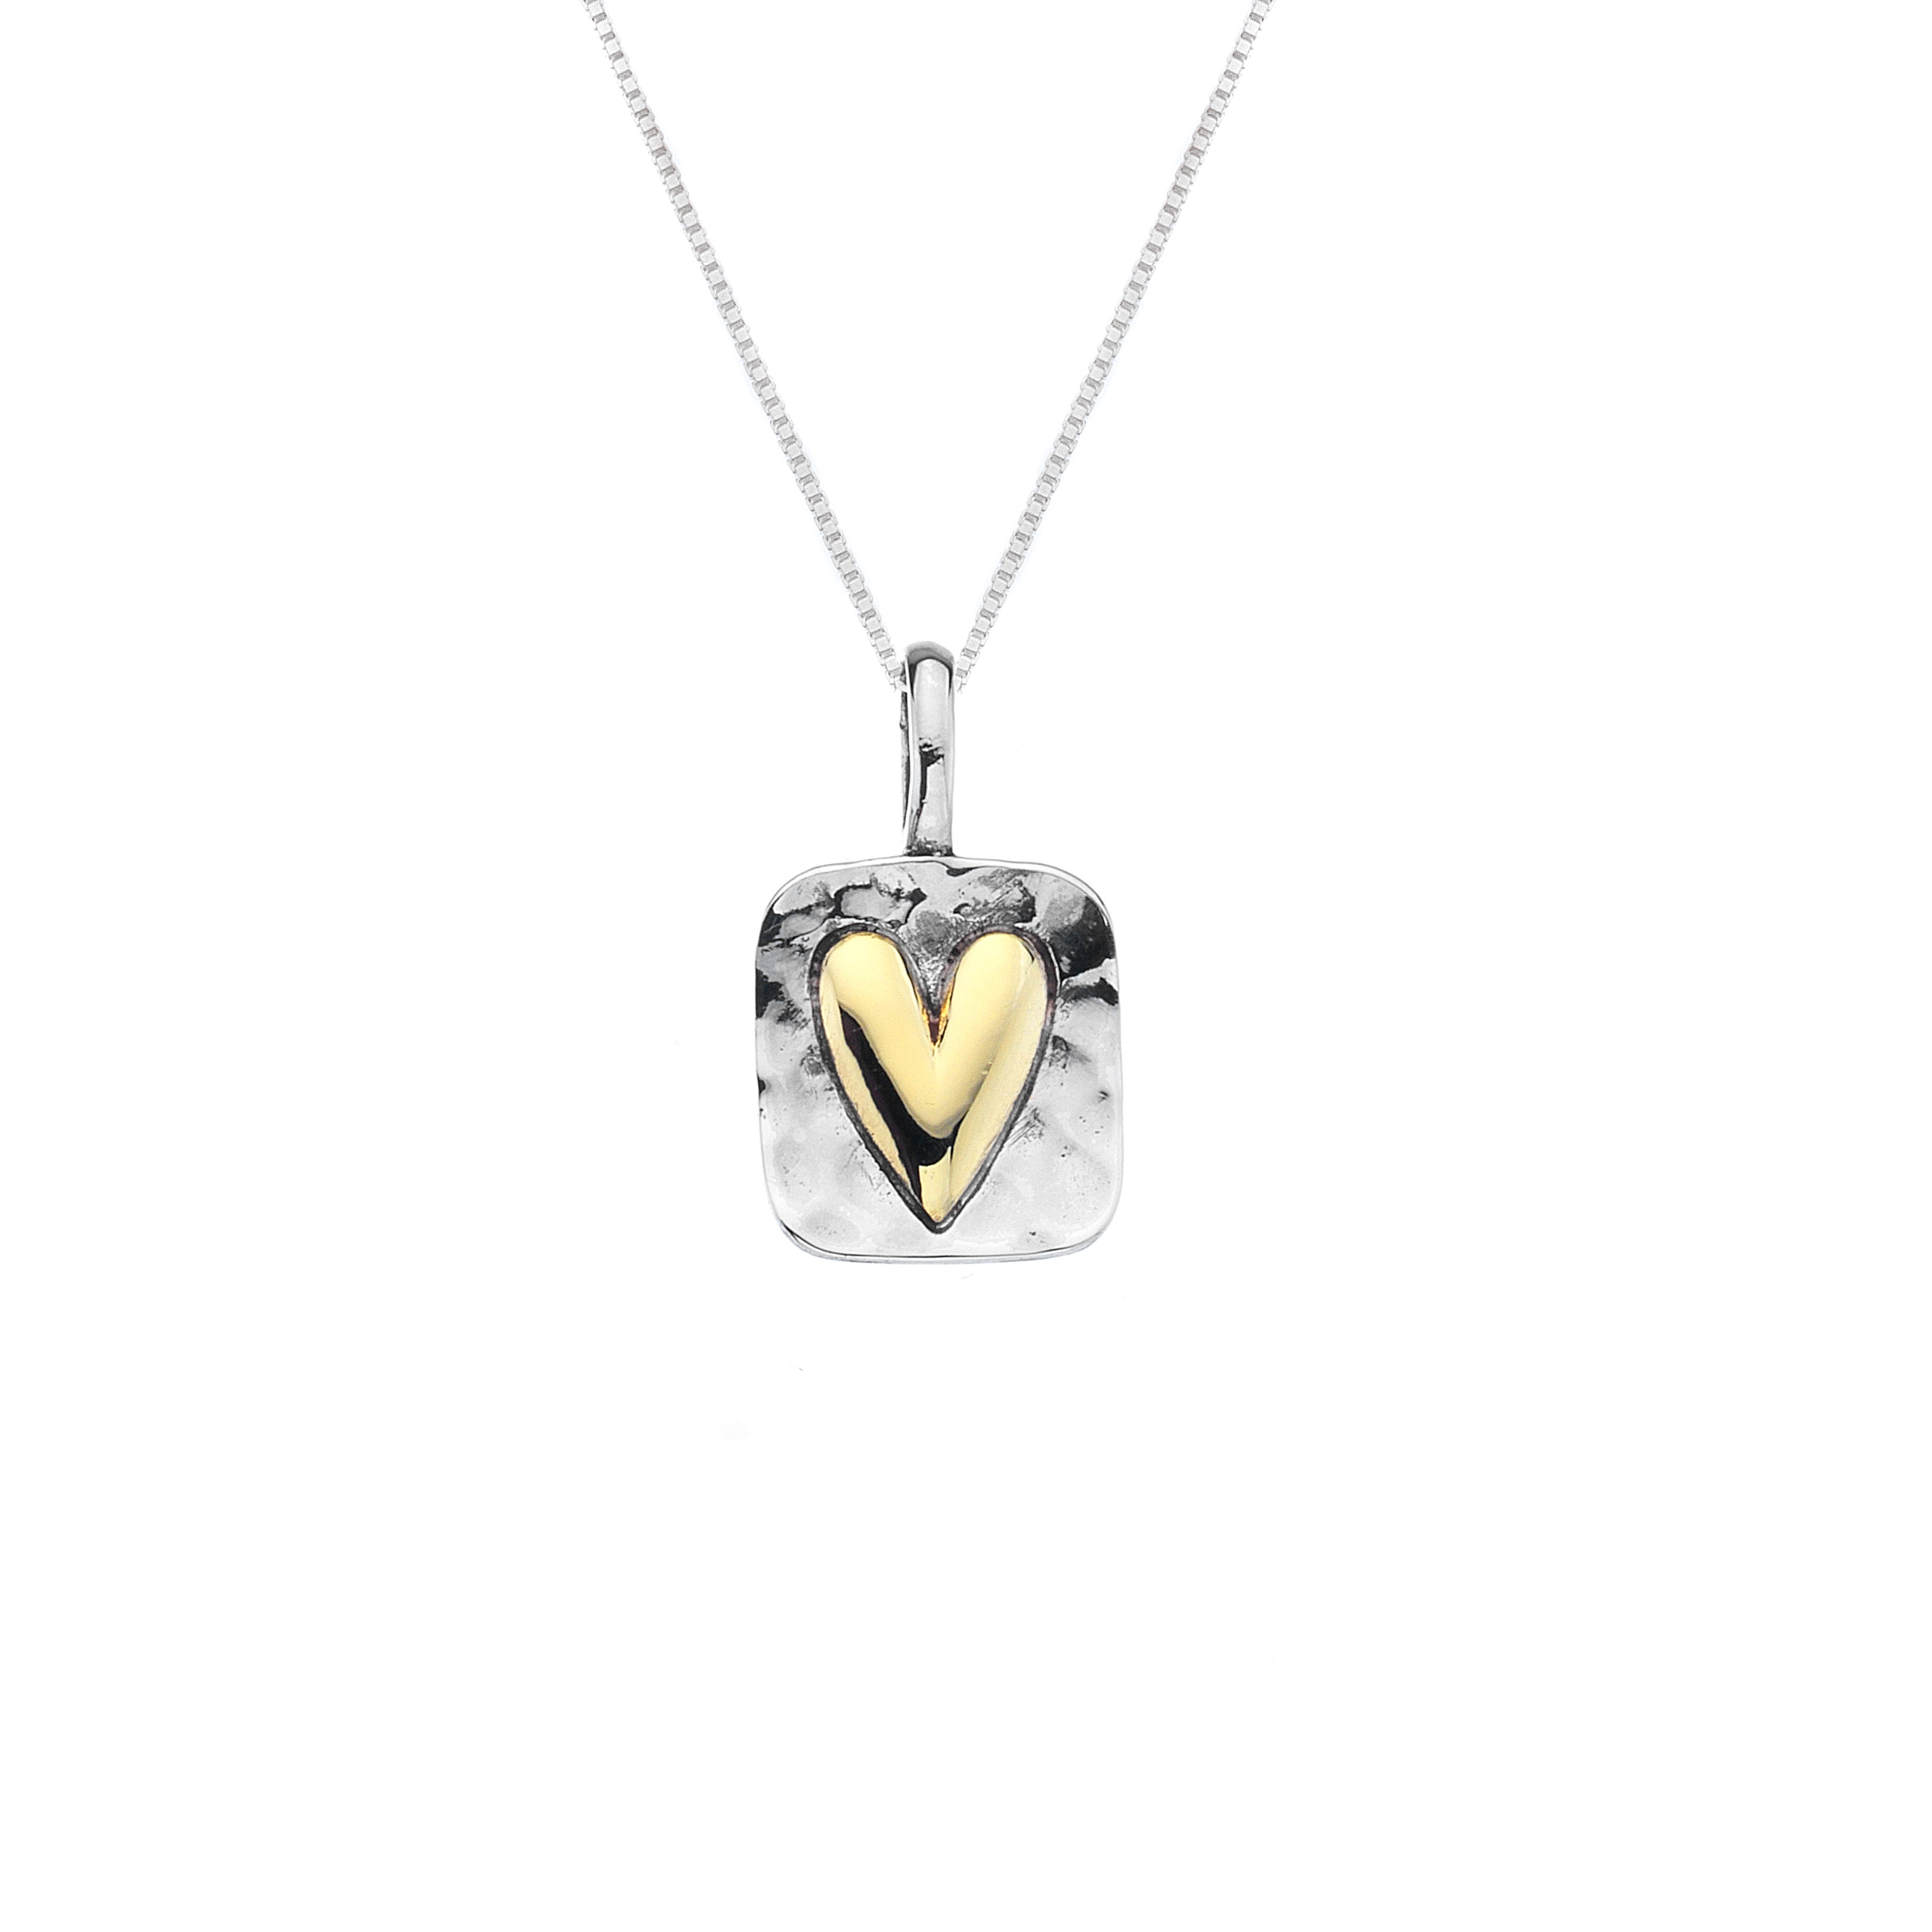 Silver Framed Heart Necklace